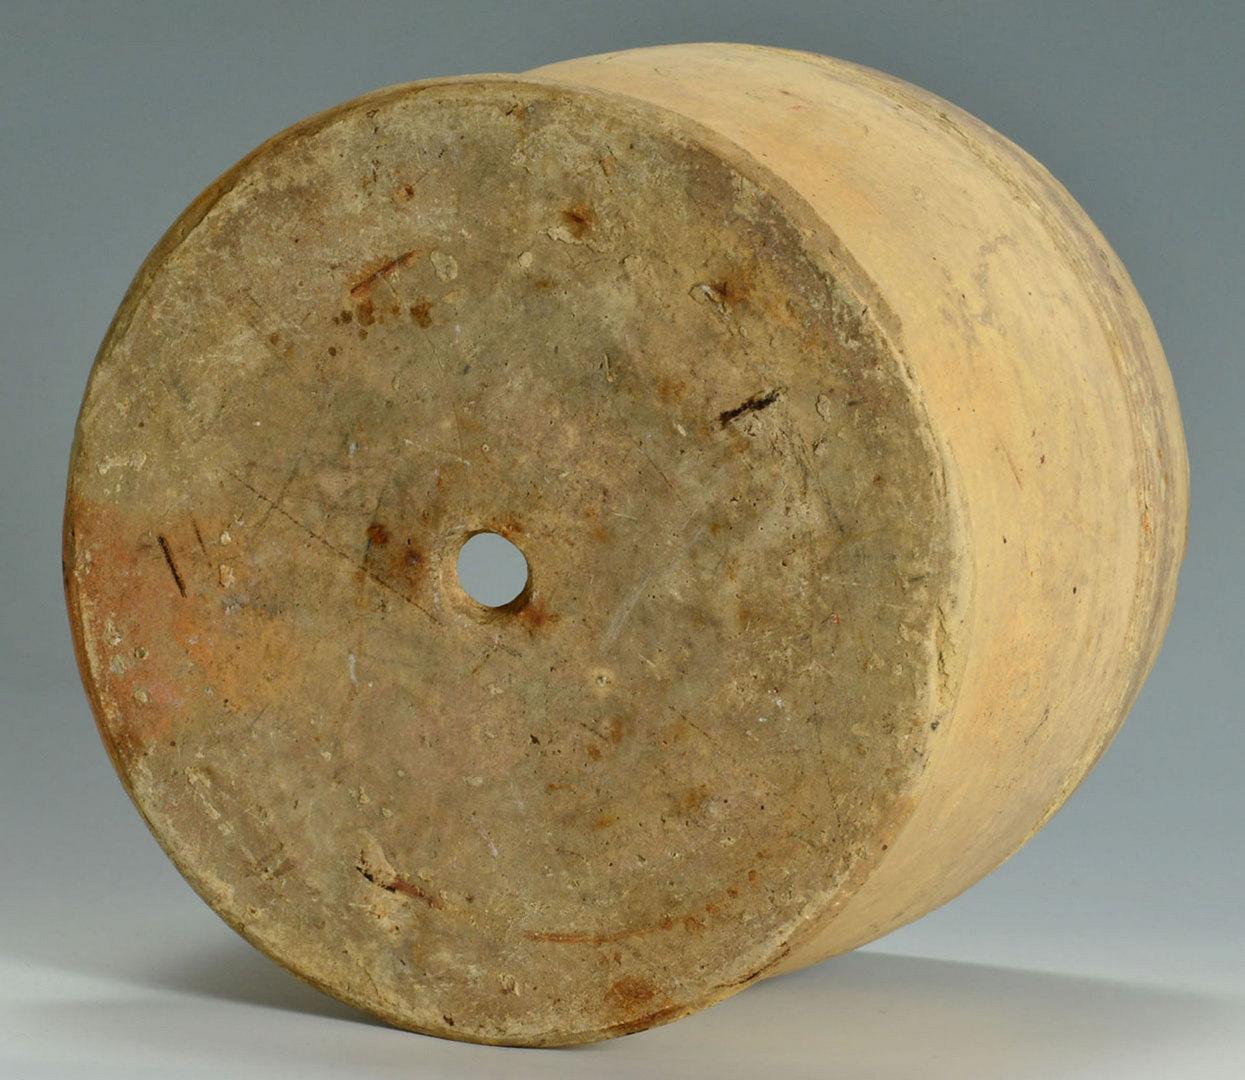 Lot 554: Incised Redware Jug & Sine Wave Stoneware Planter